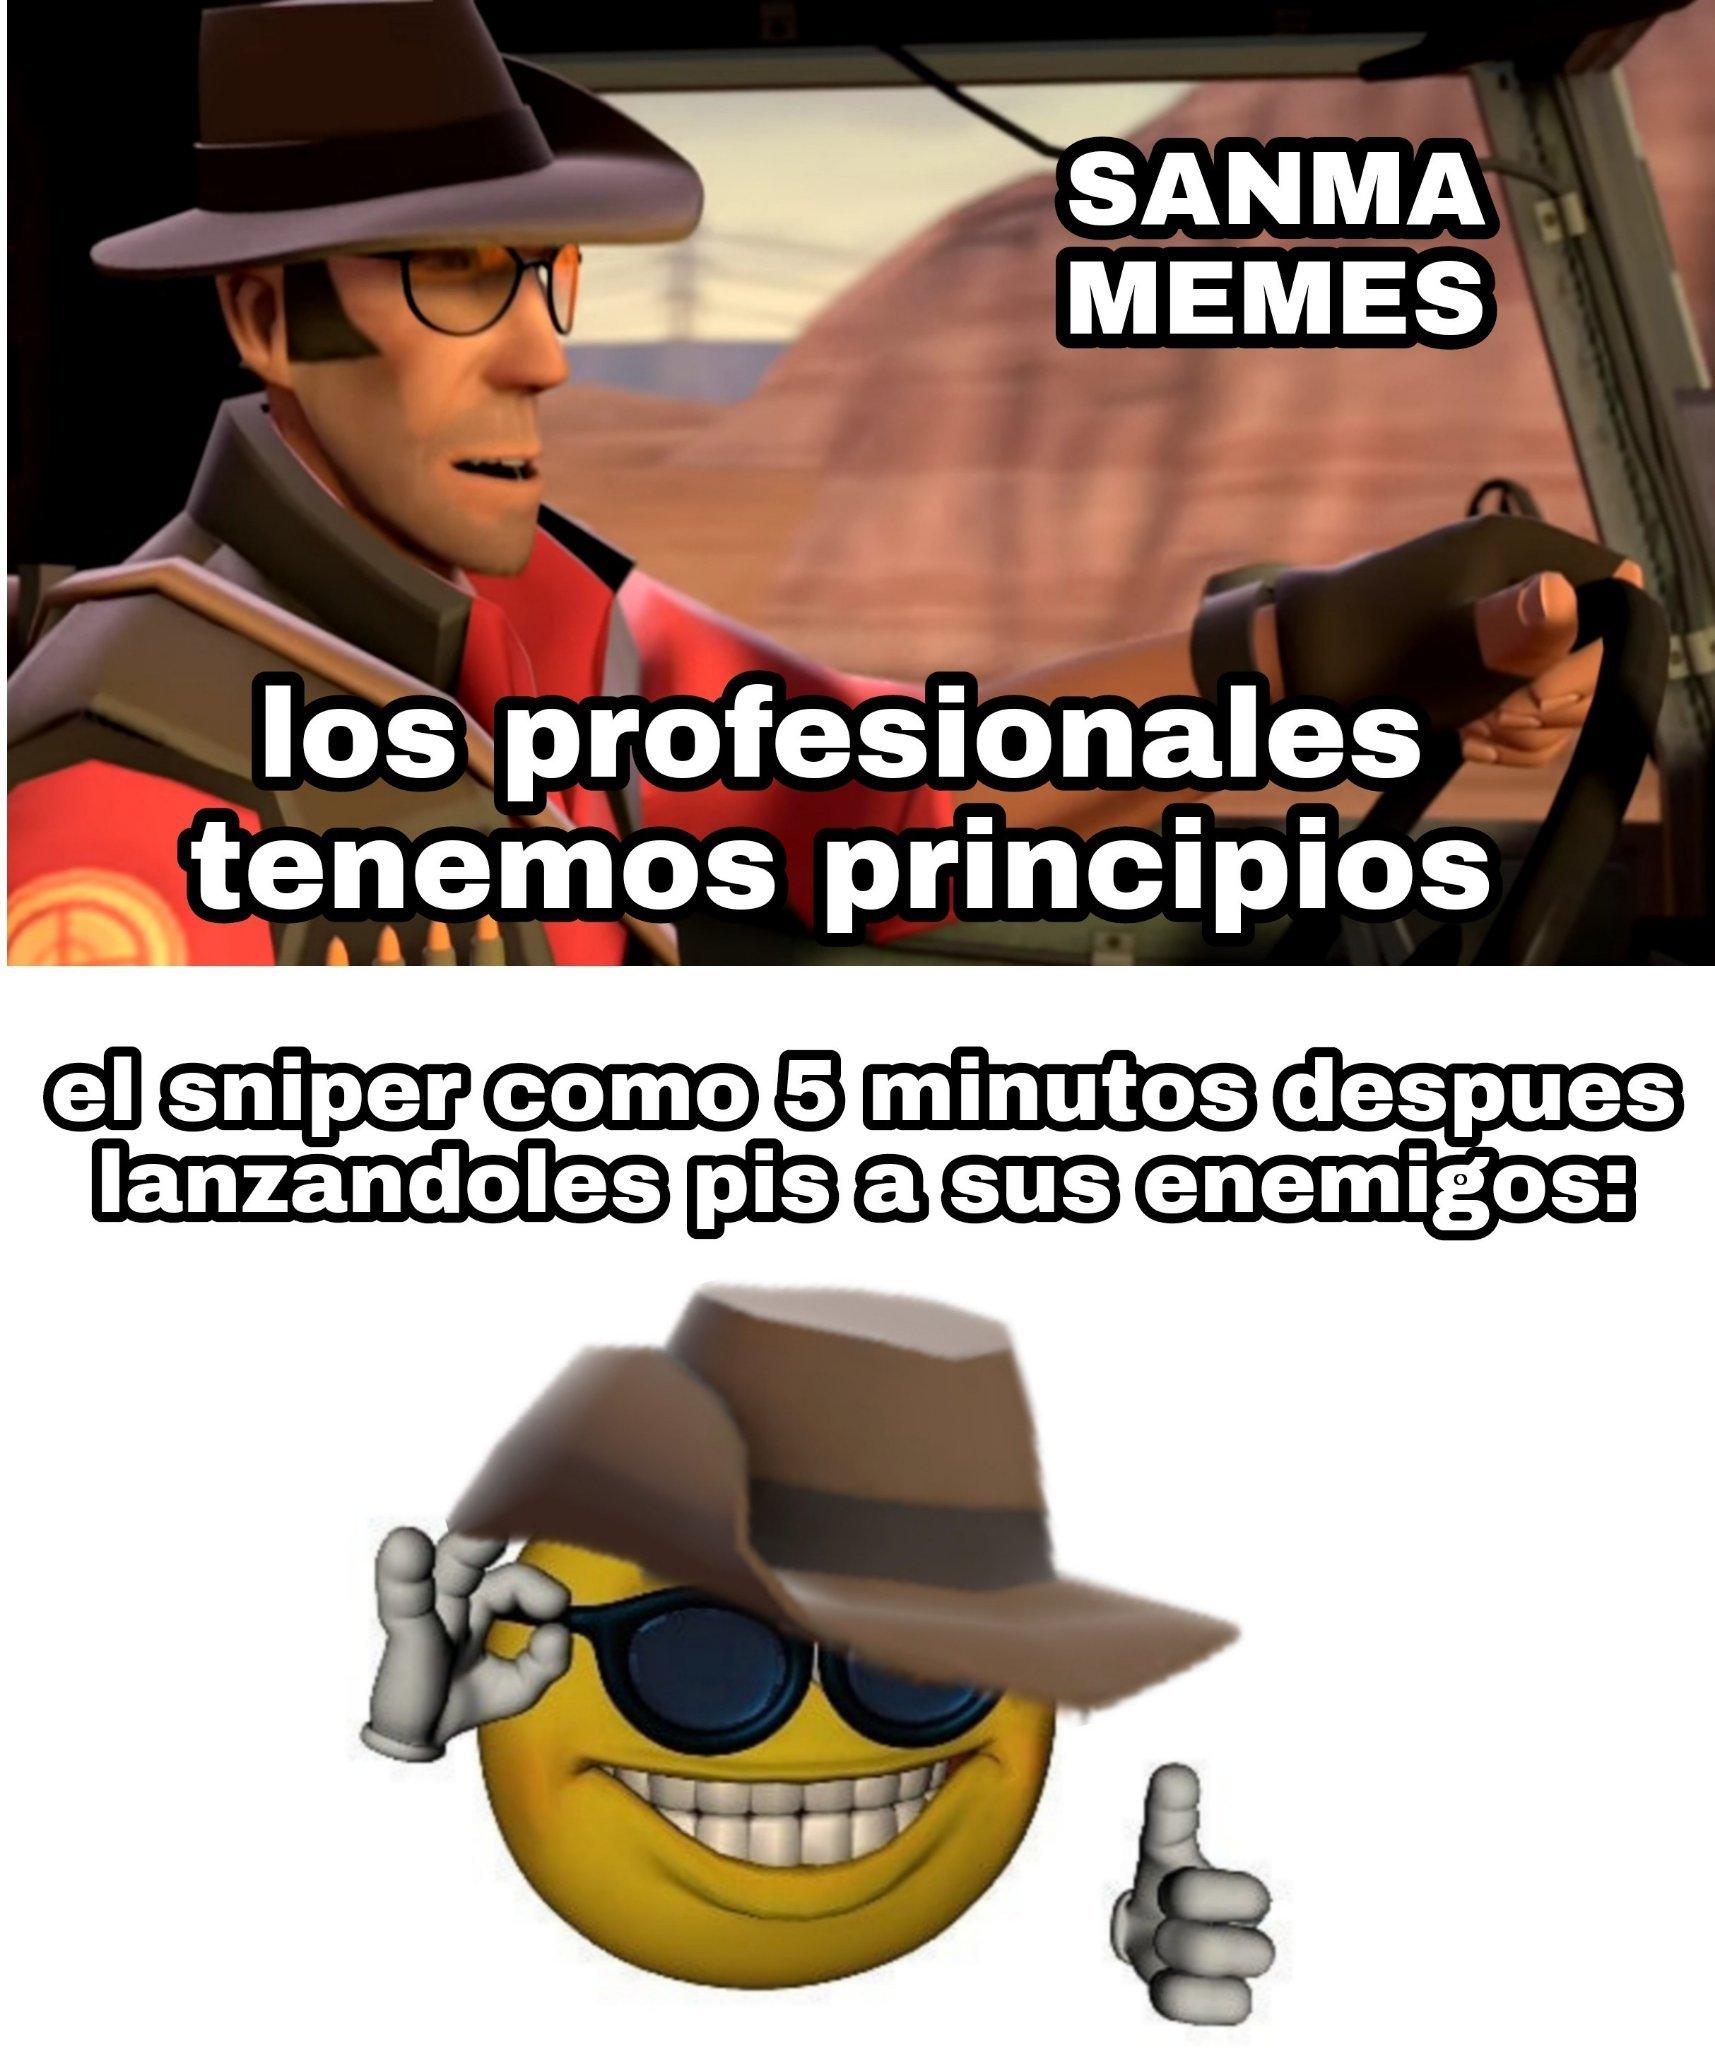 Buena esa sniper - meme